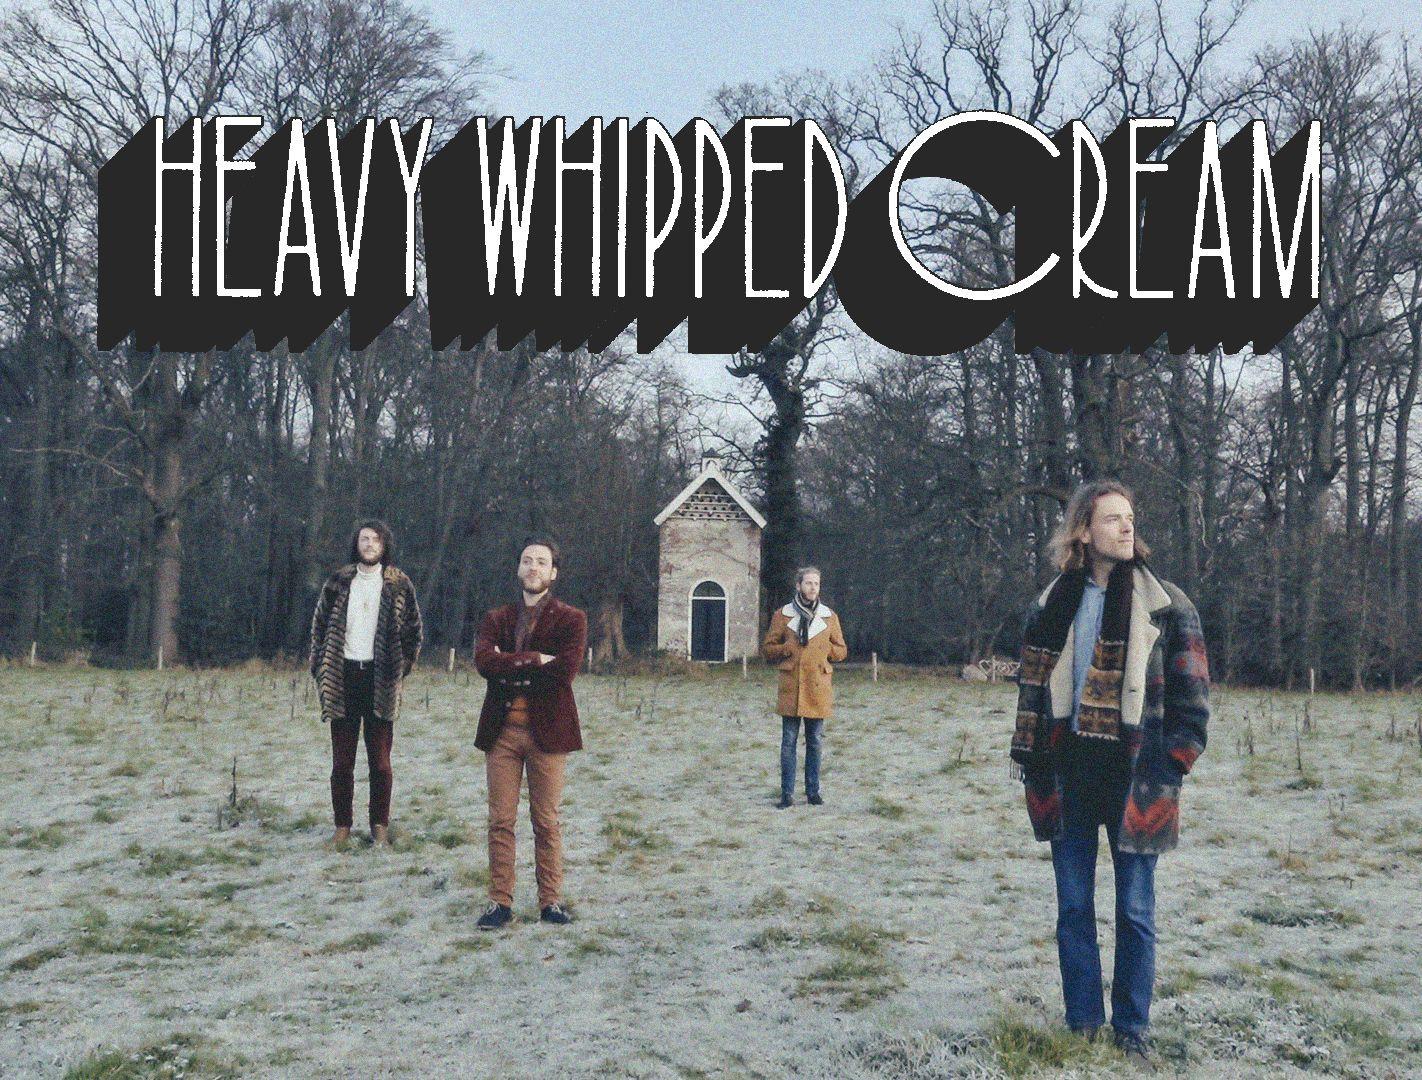 Heavy Whipped Cream